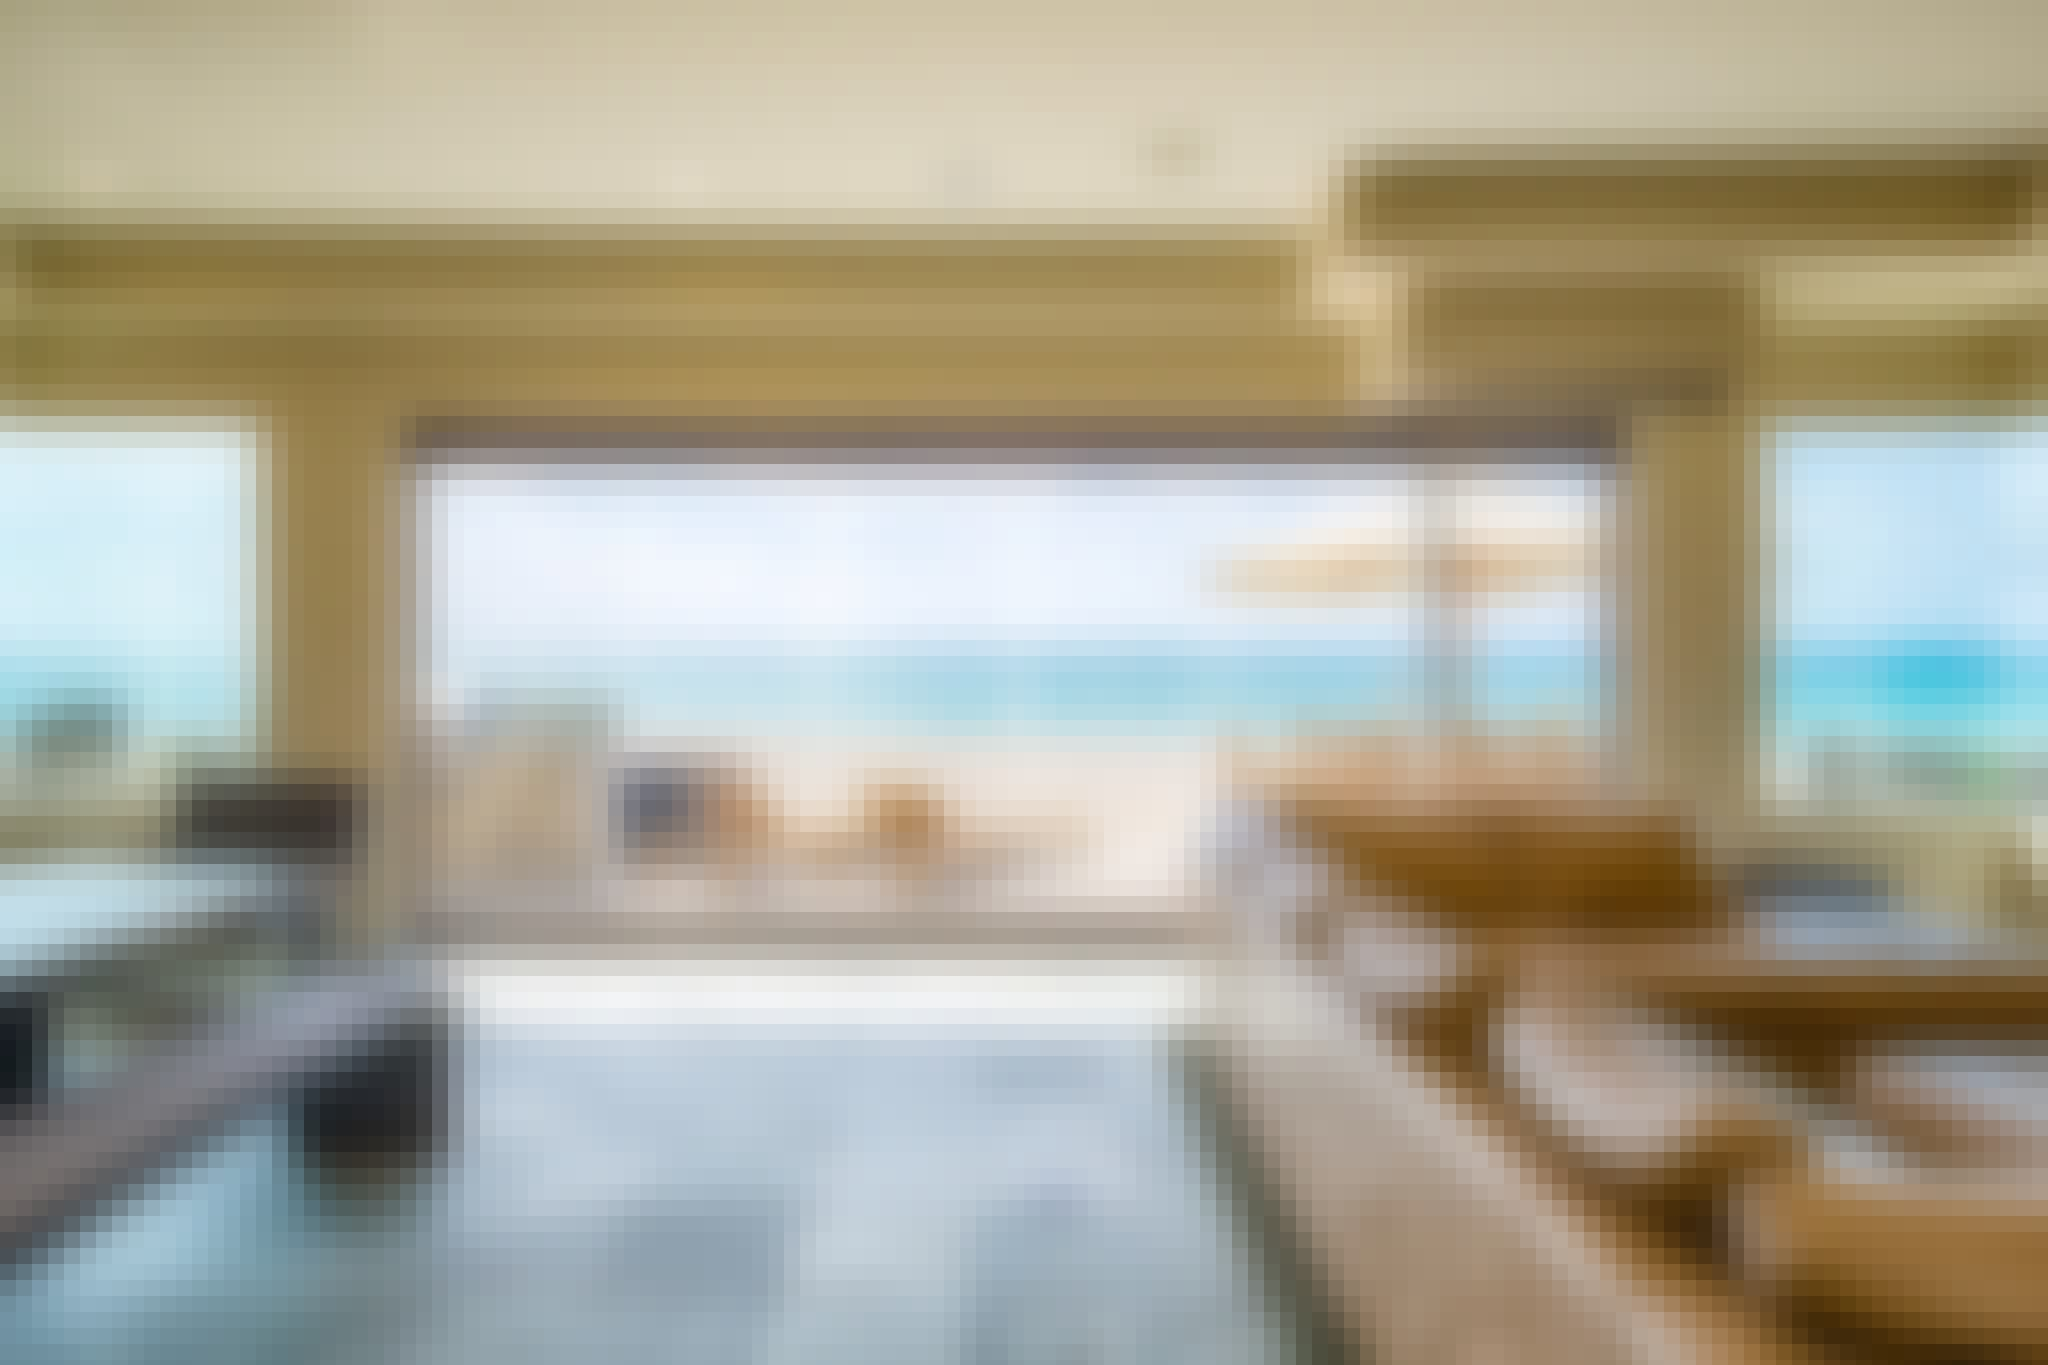 frameless exterior moving glass walls